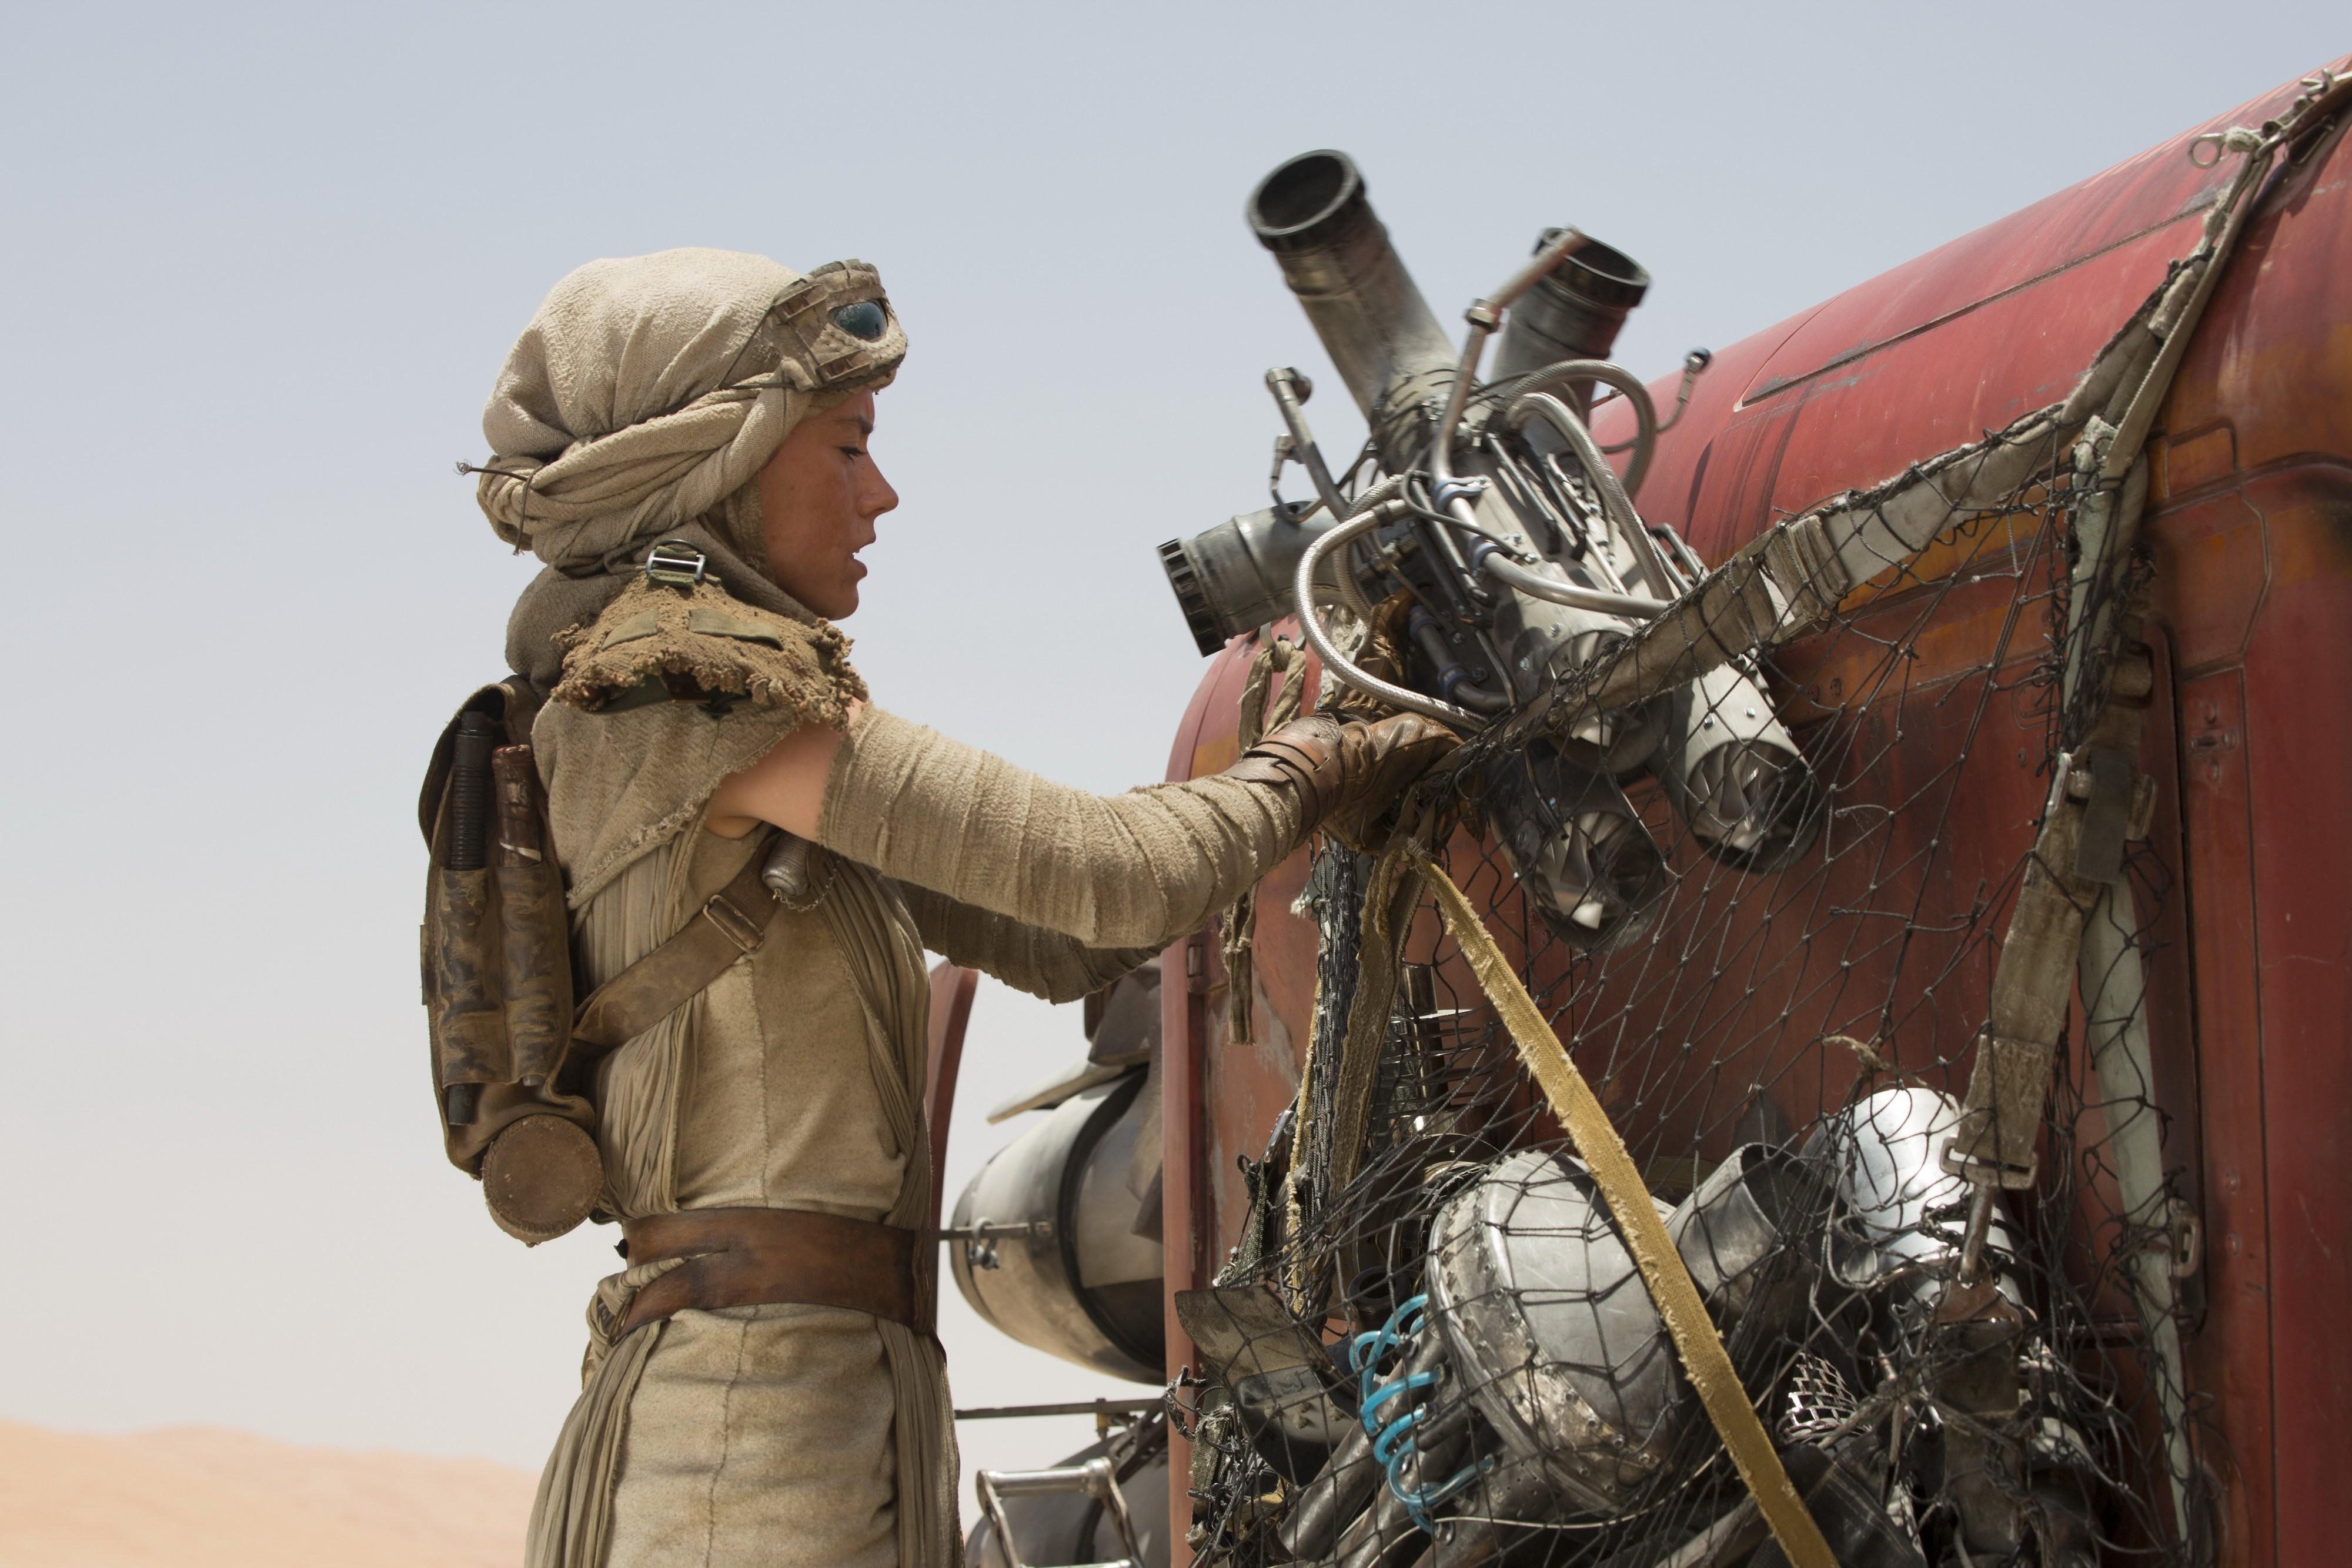 Daisy Ridley Star Wars Wallpaper: 480x800 Daisy Ridley Star Wars 3 Galaxy Note,HTC Desire